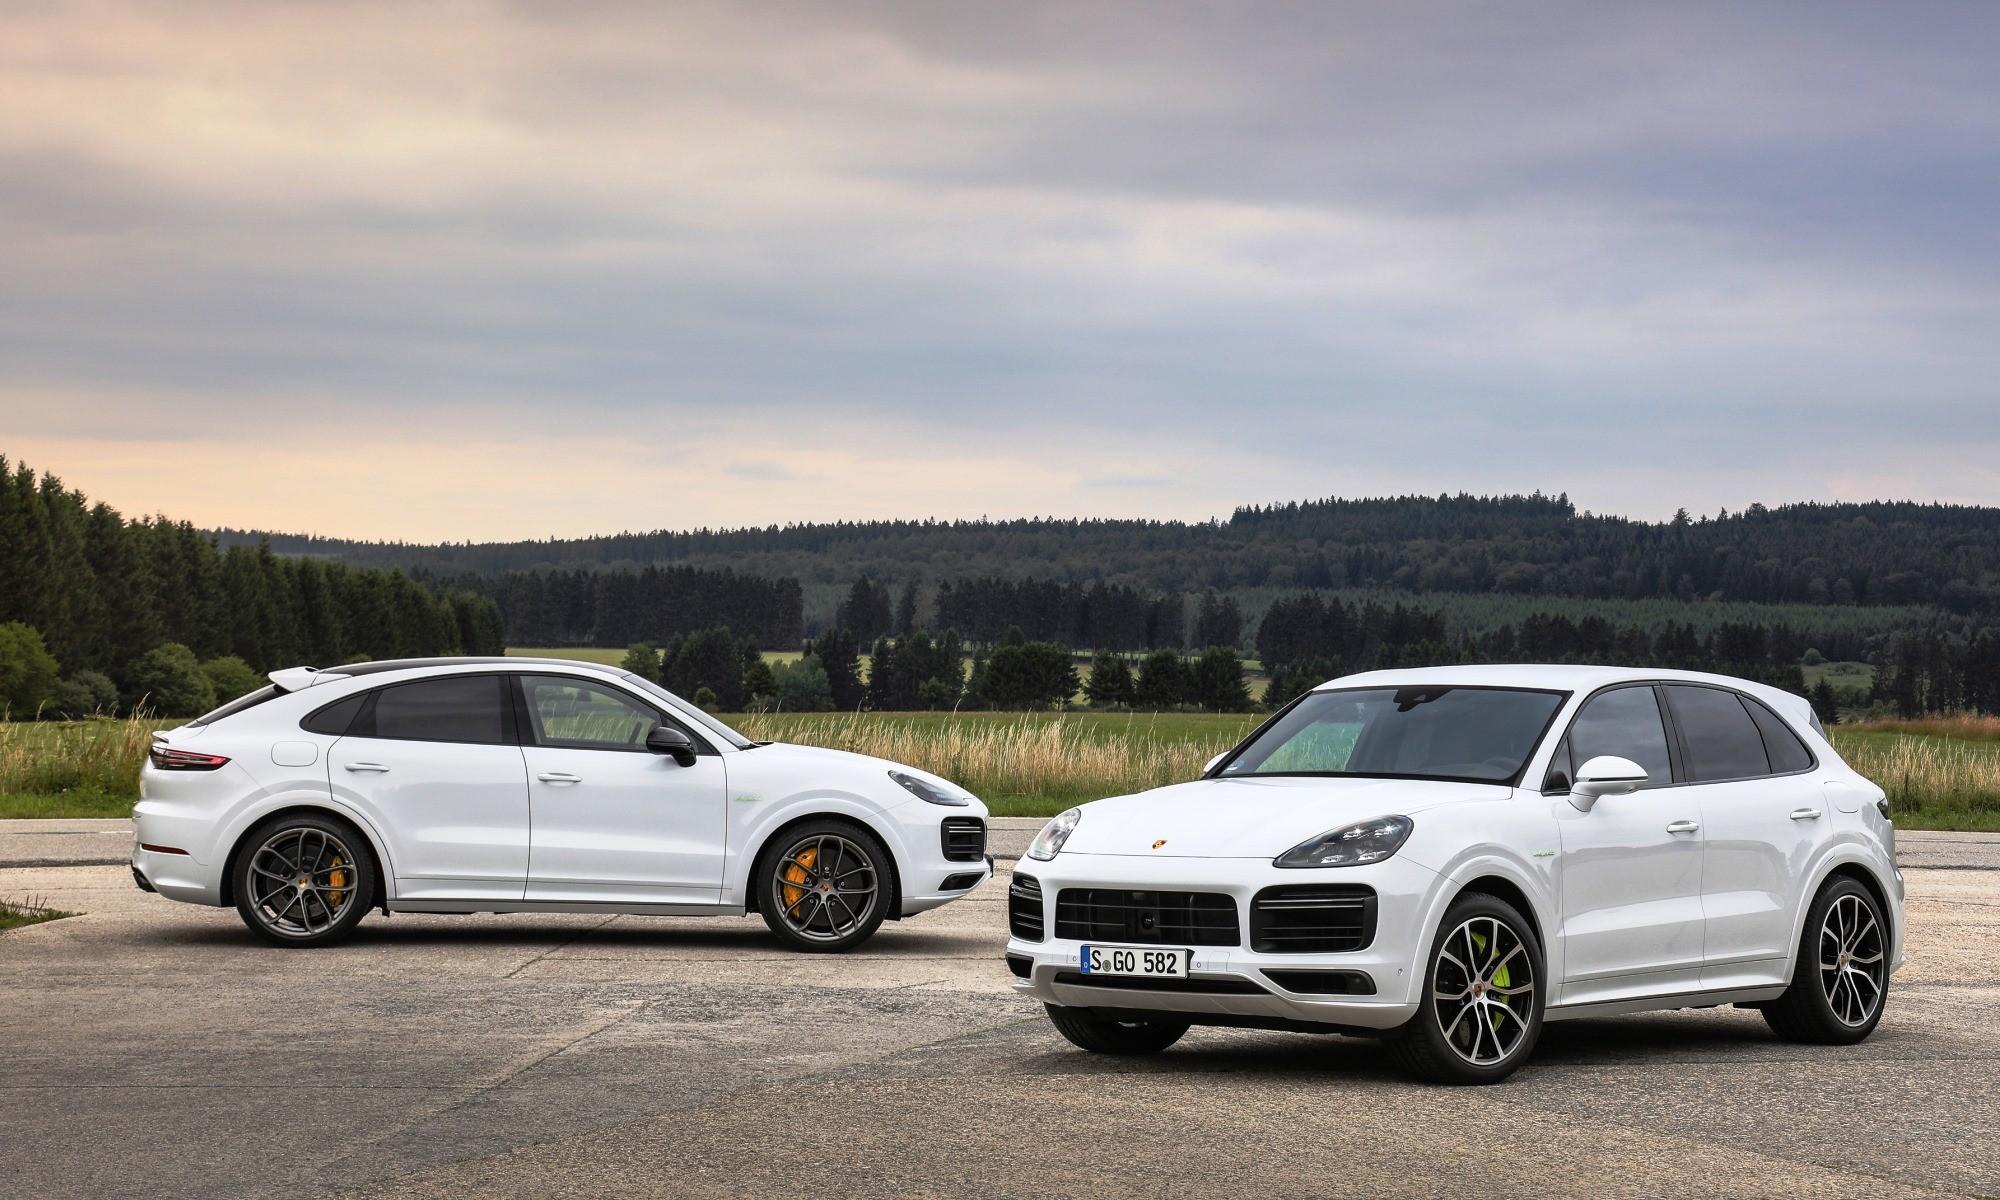 Porsche Cayenne Hybrid Turbo Models